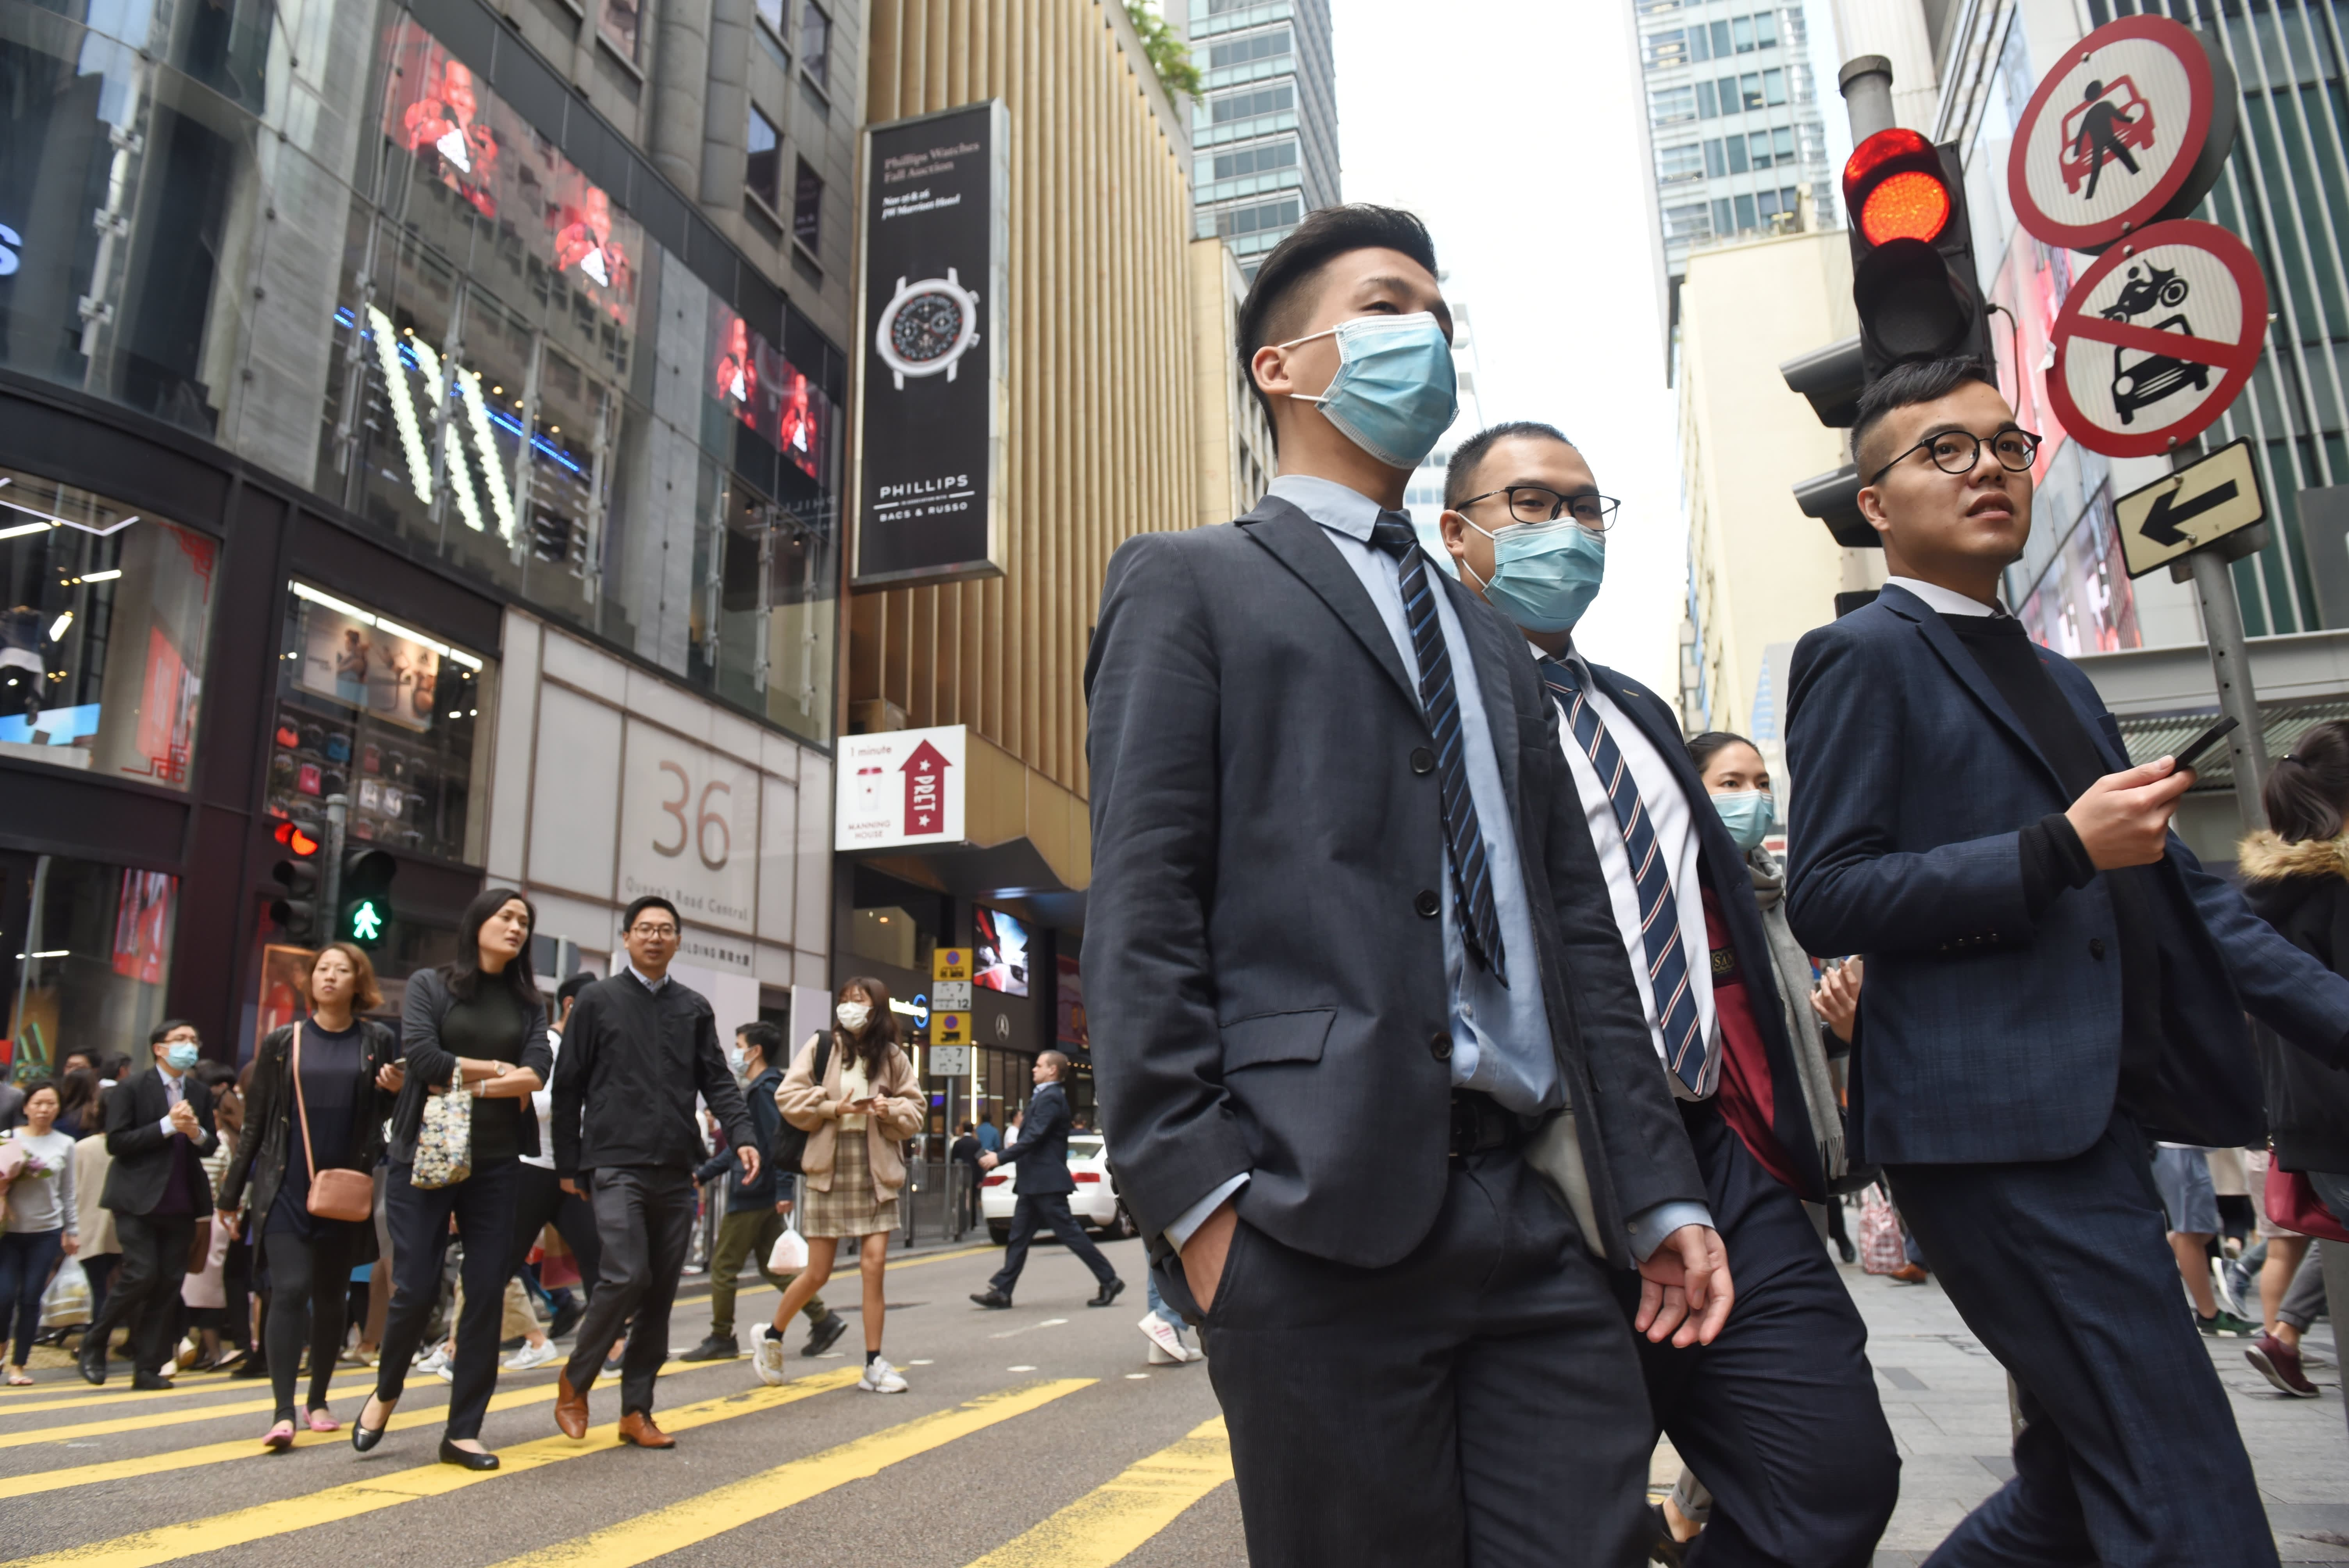 History shows China's coronavirus impact on markets likely to be short-lived